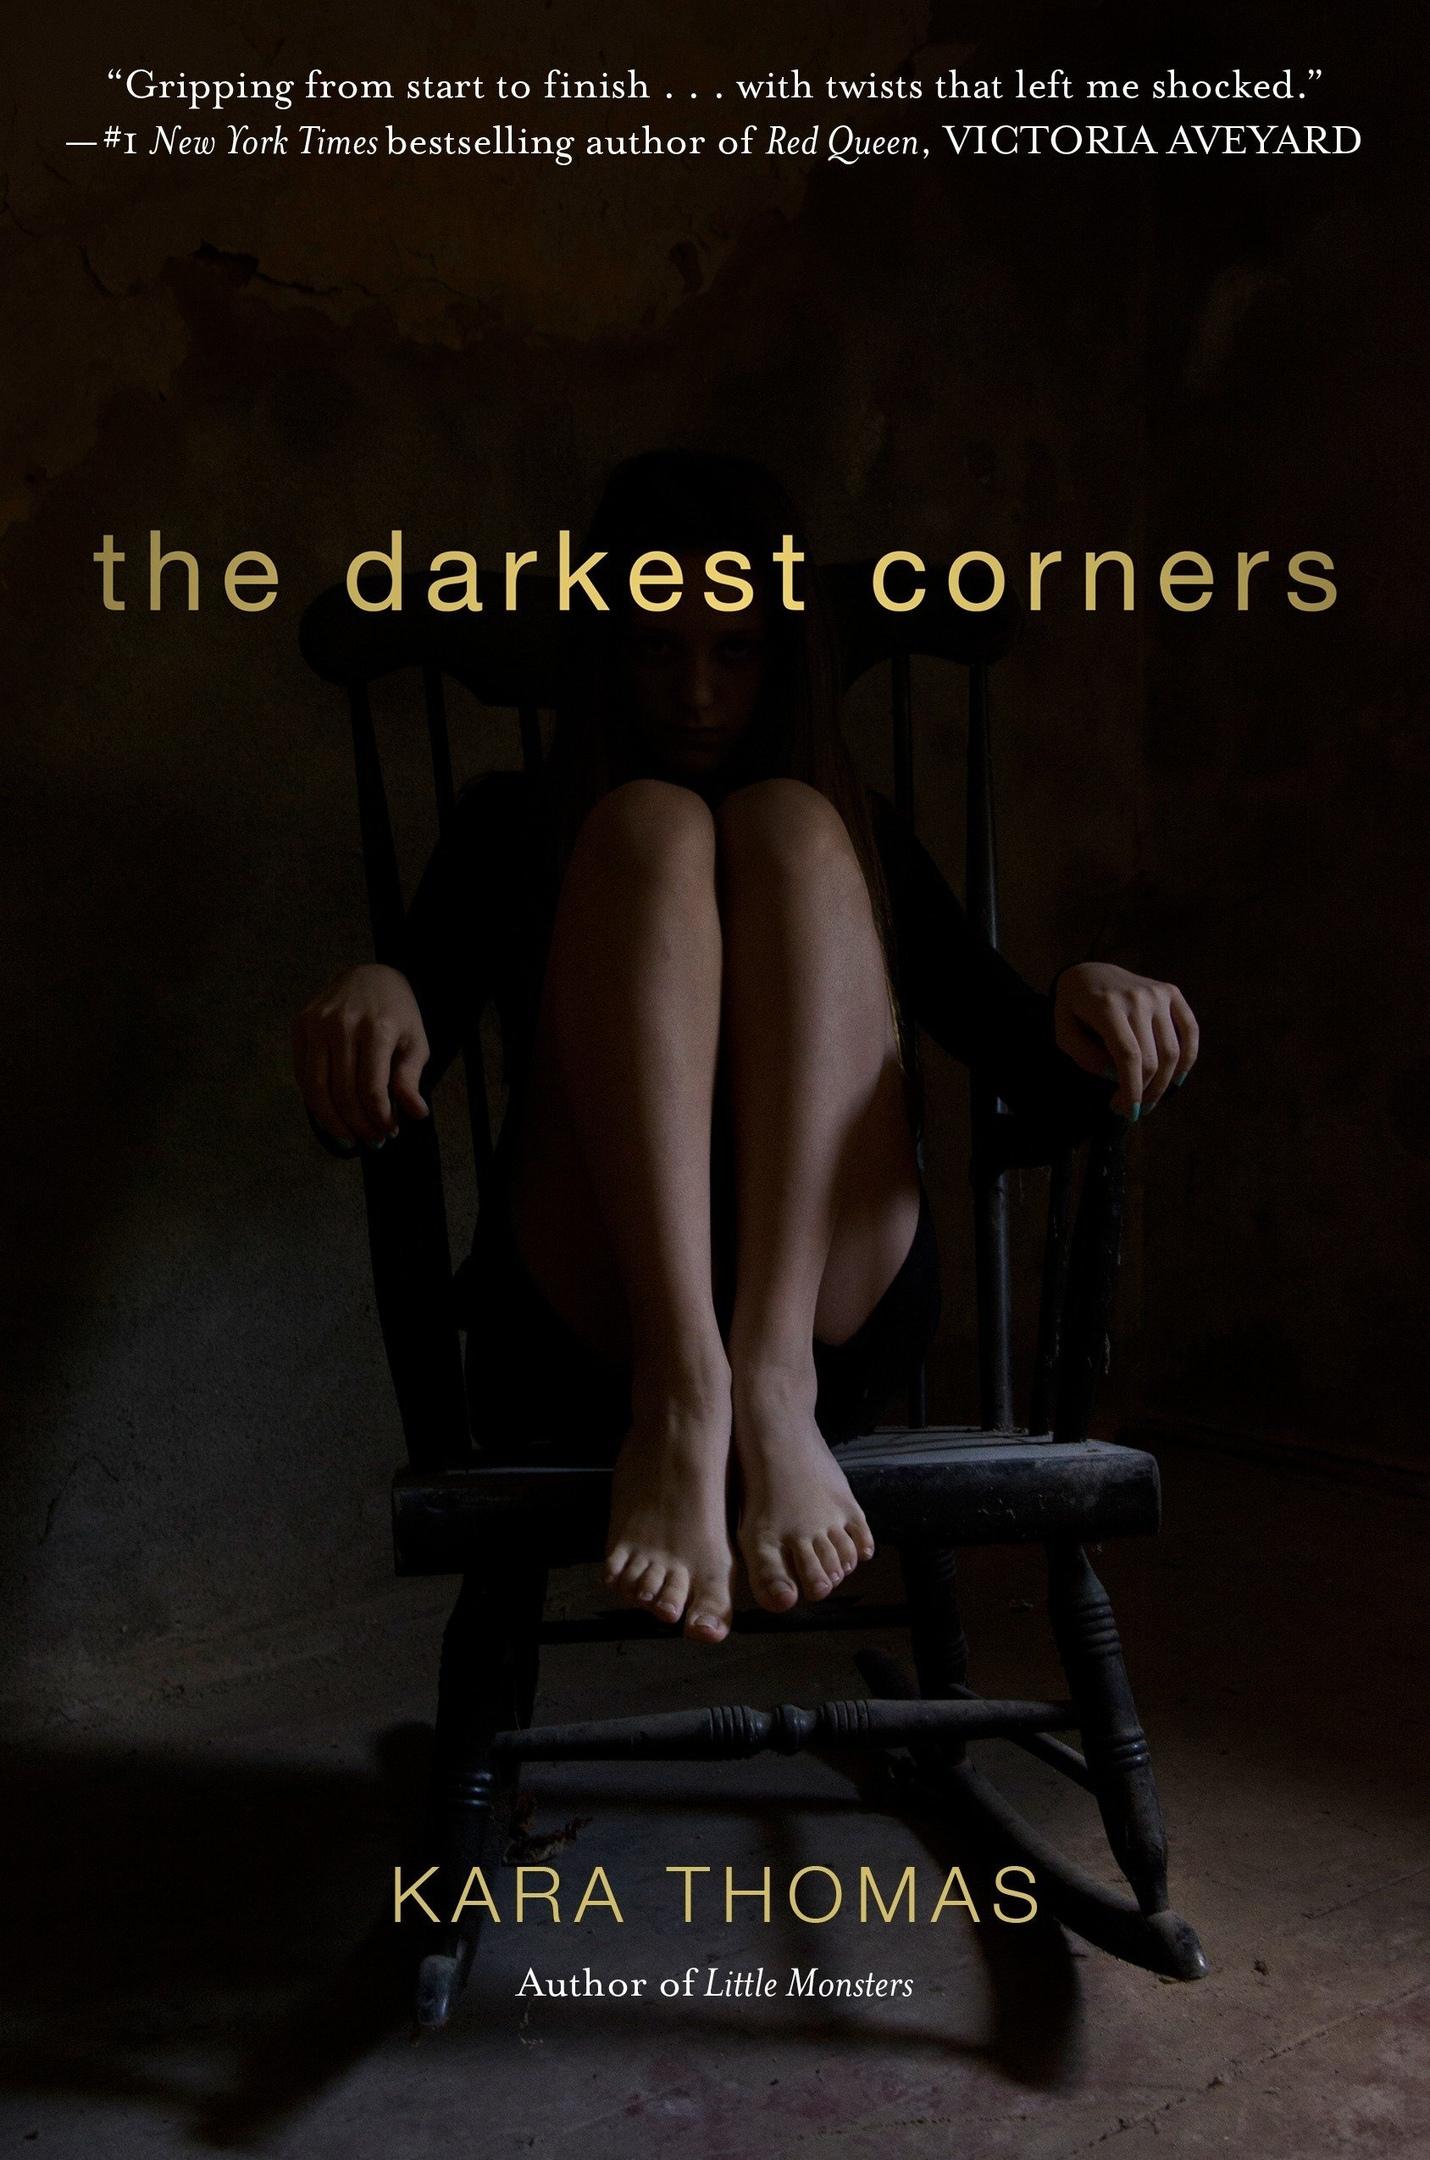 Kara Thomas – The Darkest Corners Genre: